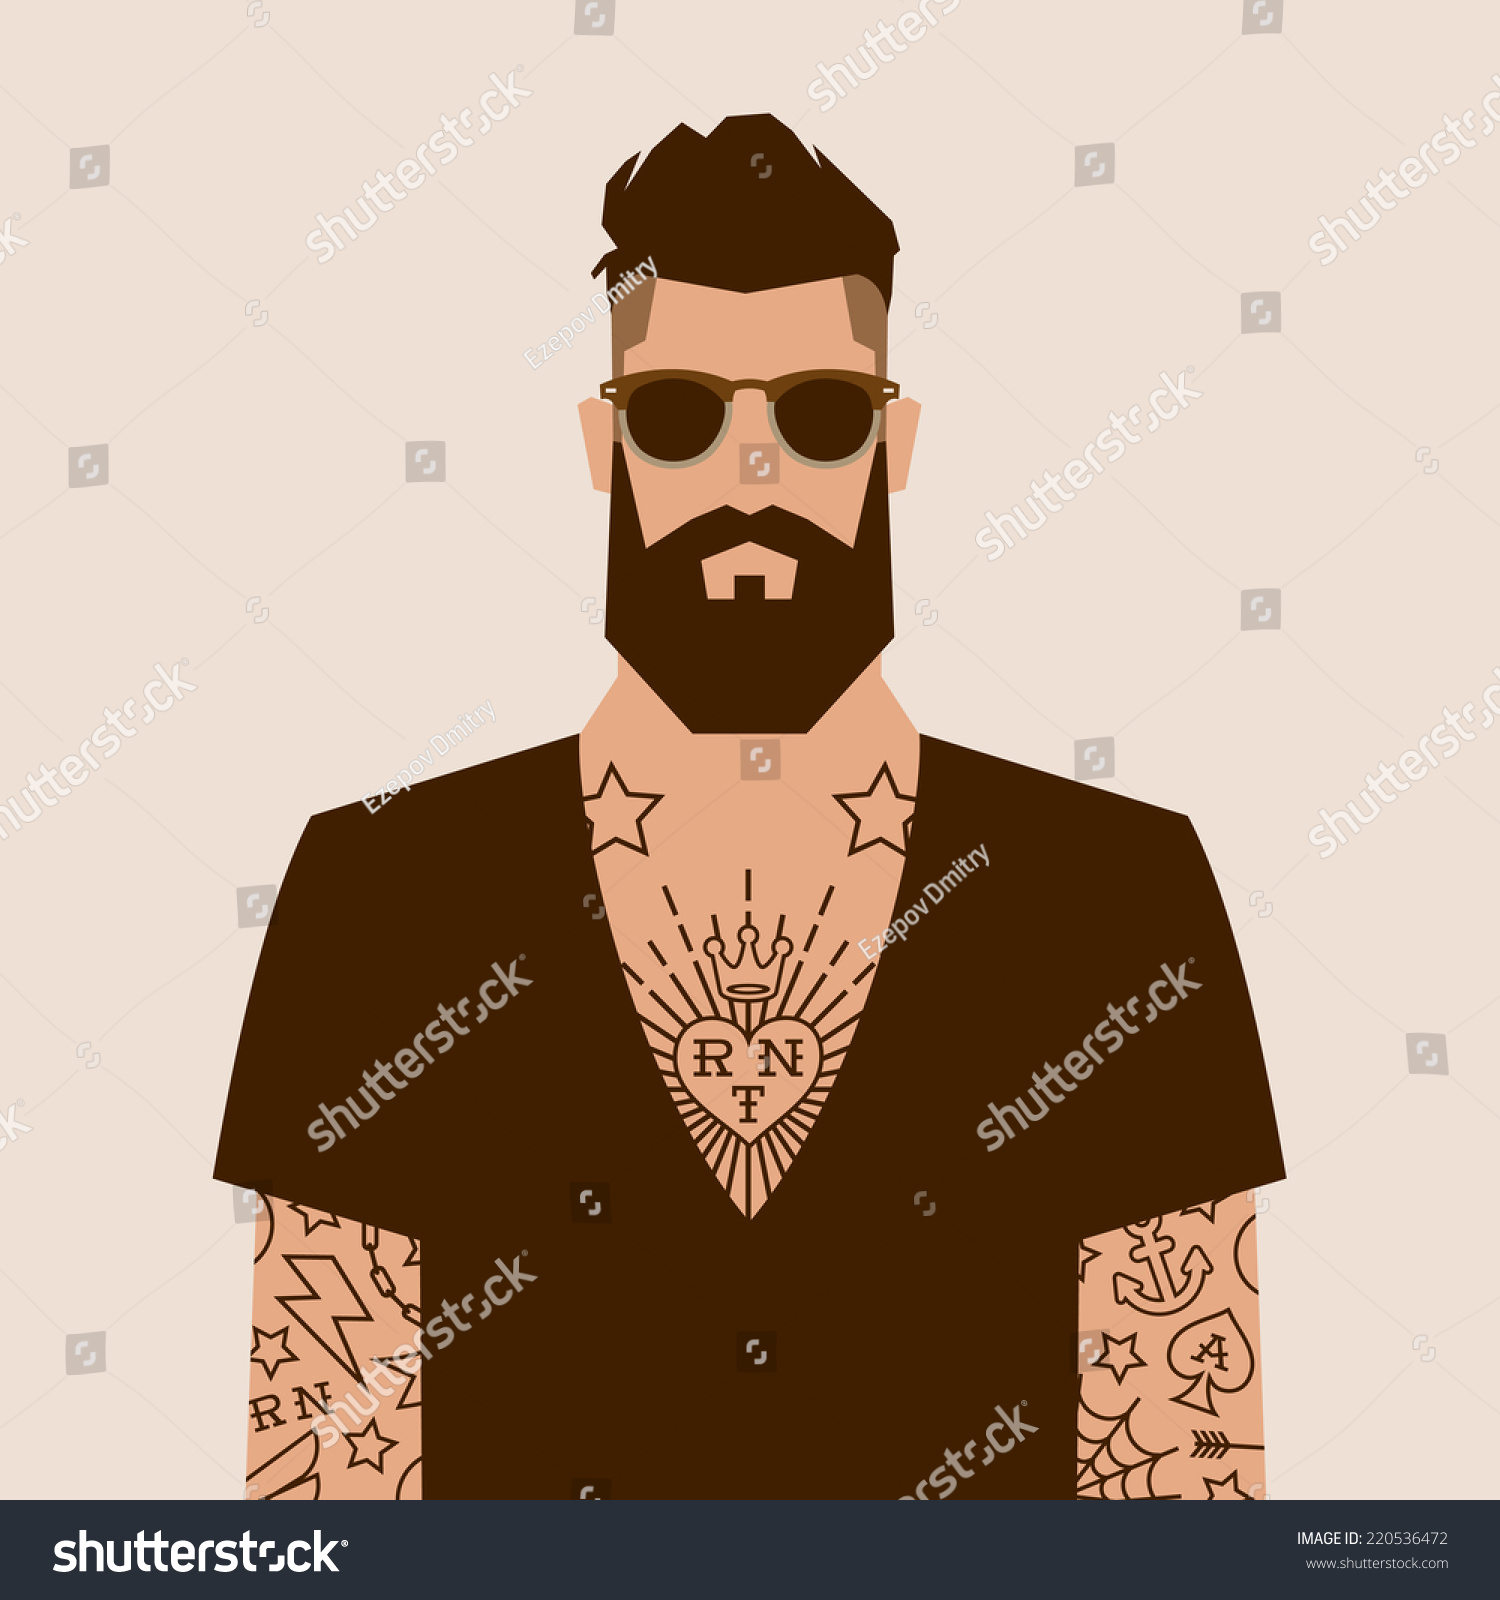 Vector Character Design Illustrator : Flat cartoon hipster character vector illustration stock